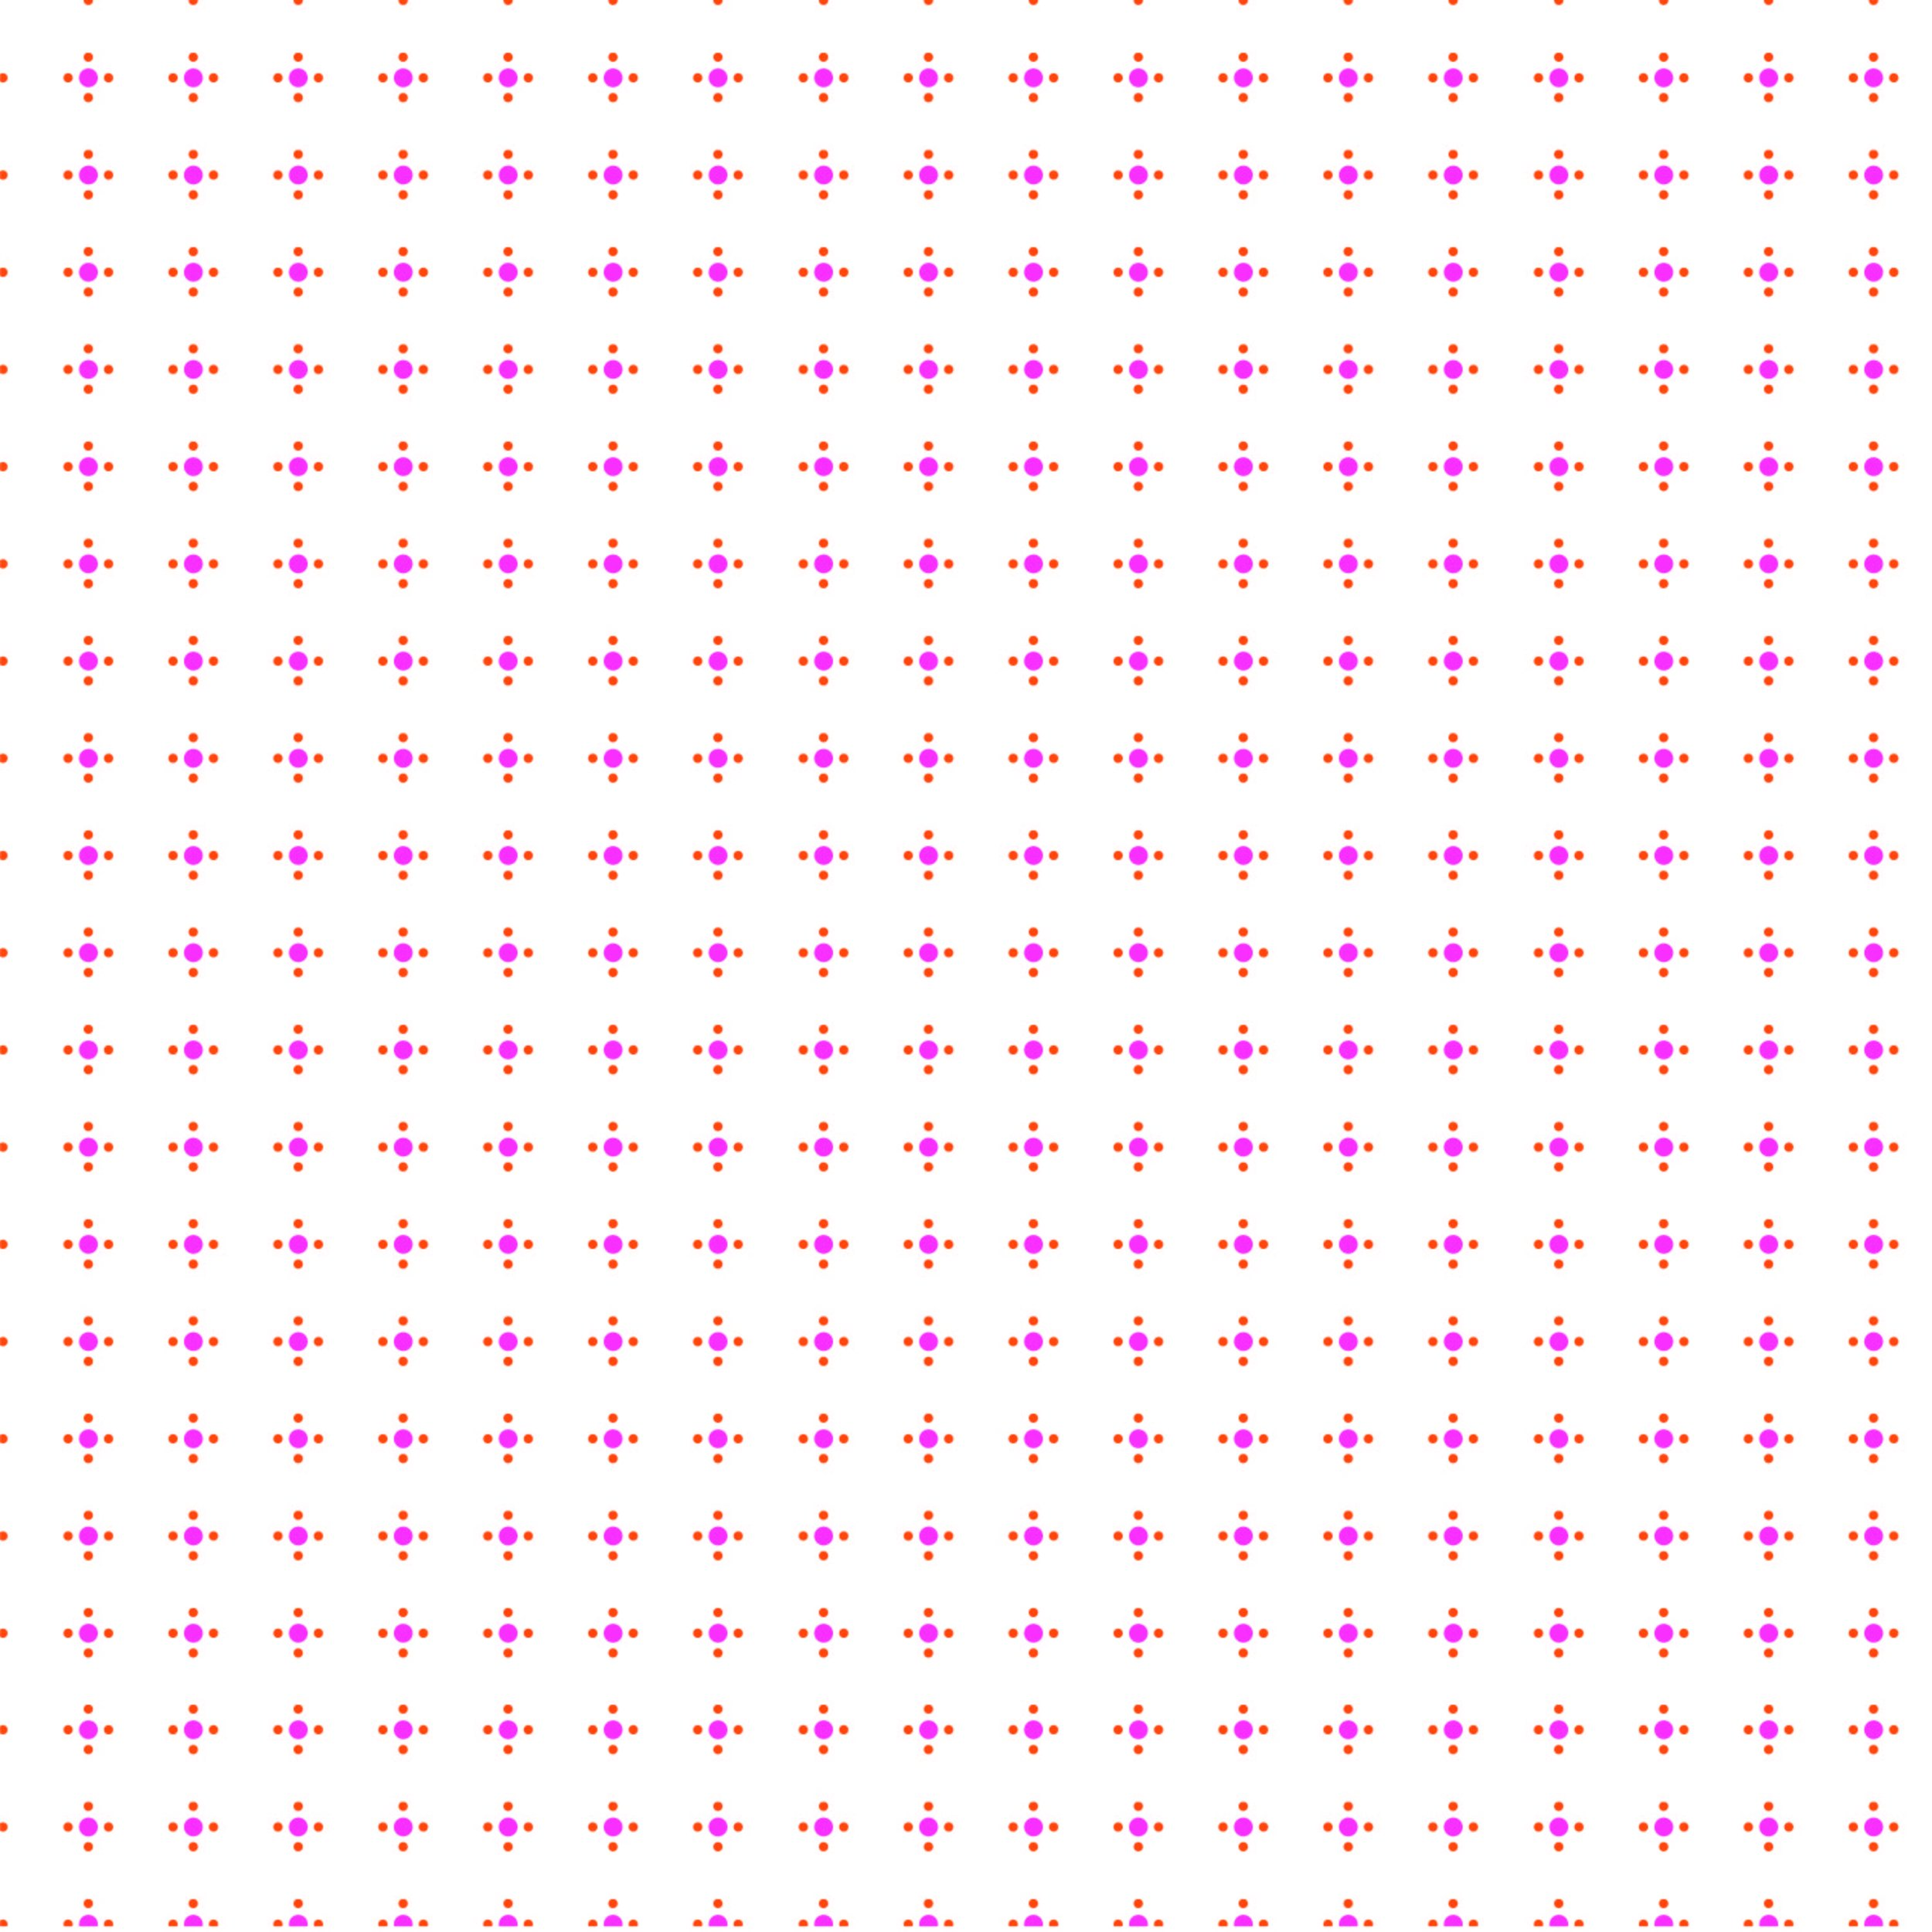 patterns for texas-20.jpg